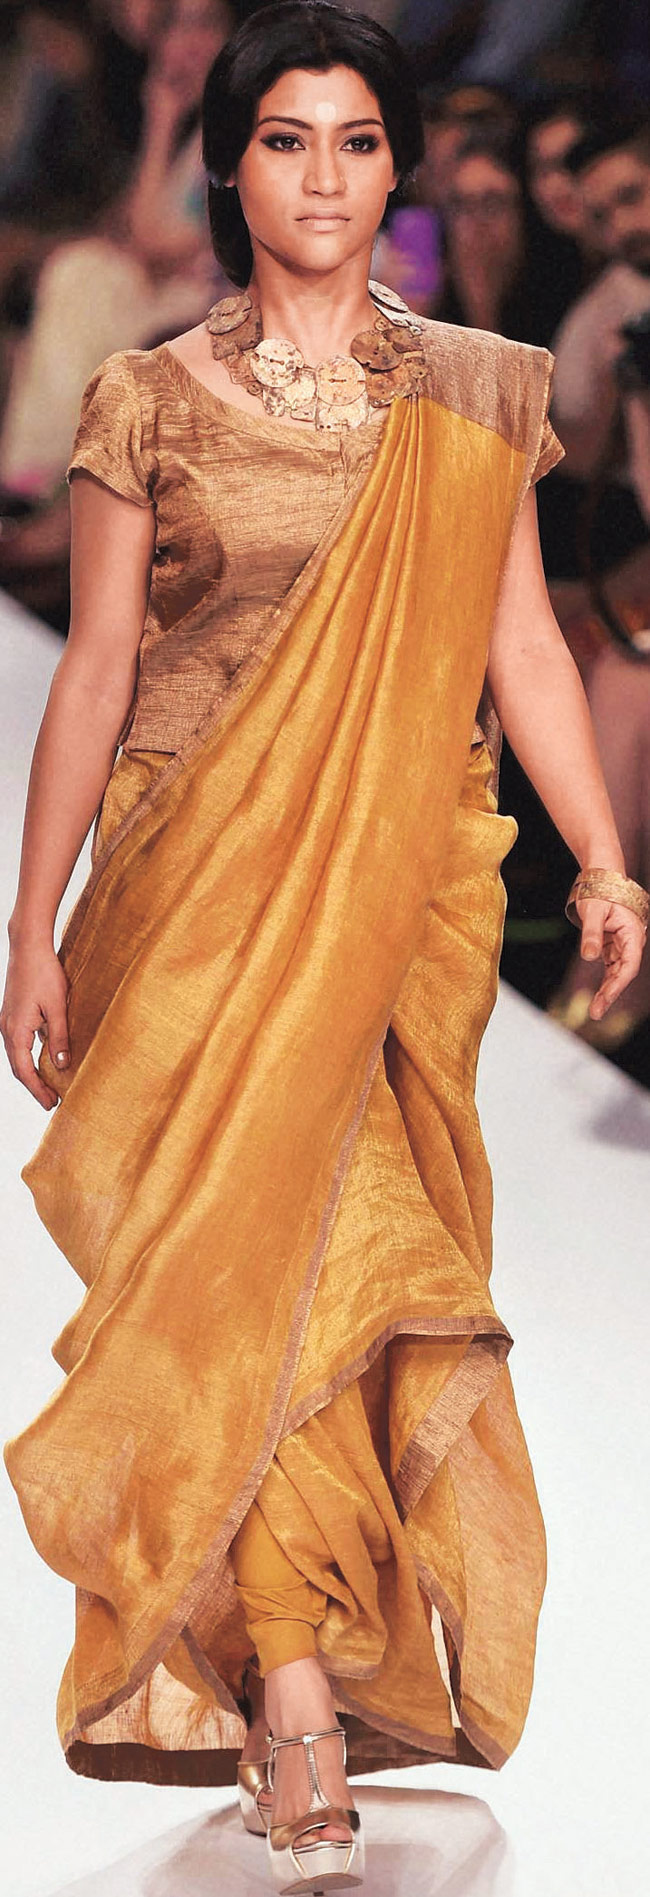 Konkana Sen Sharma walks for designer Anavila Mishra